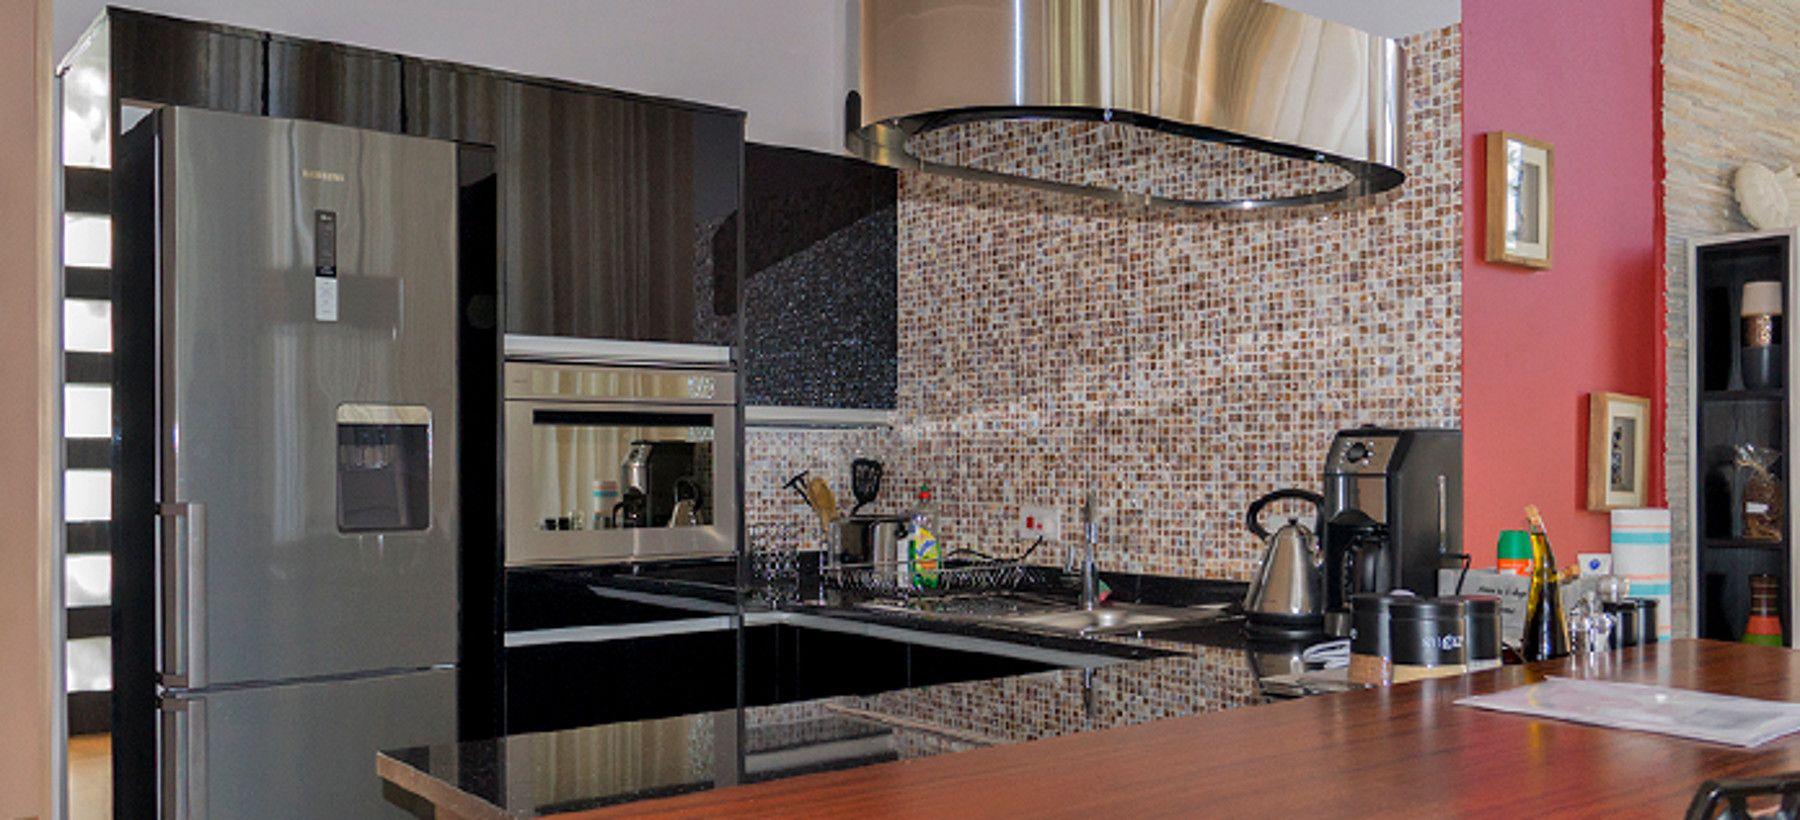 The terrace apartments zambia for Kitchen designs zambia